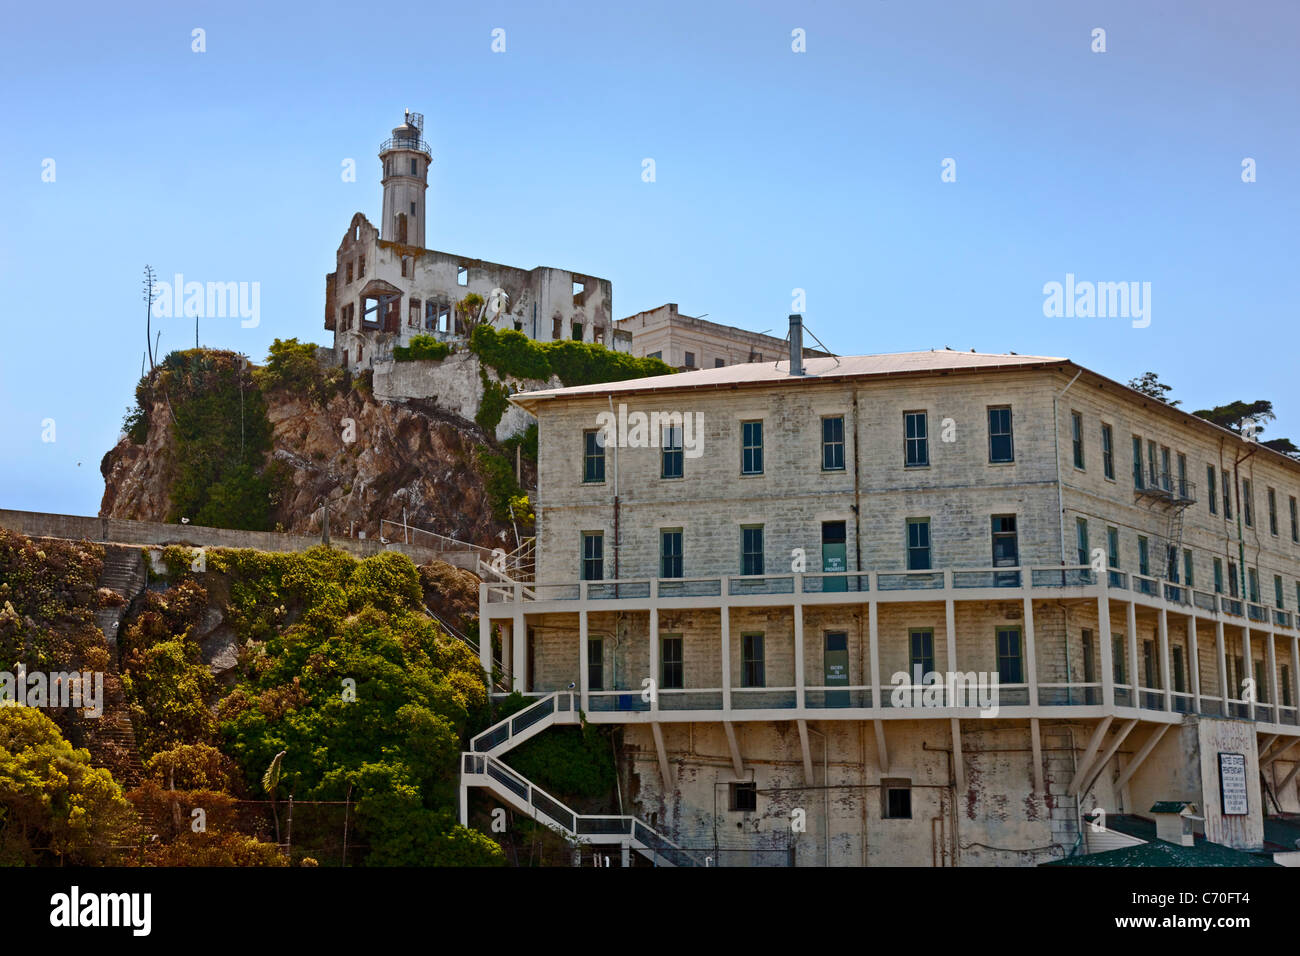 Building 64, Residential Apartments and Warden's House, Alcatraz Prison, Alcatraz Island, San Francisco Bay, CA, Stock Photo